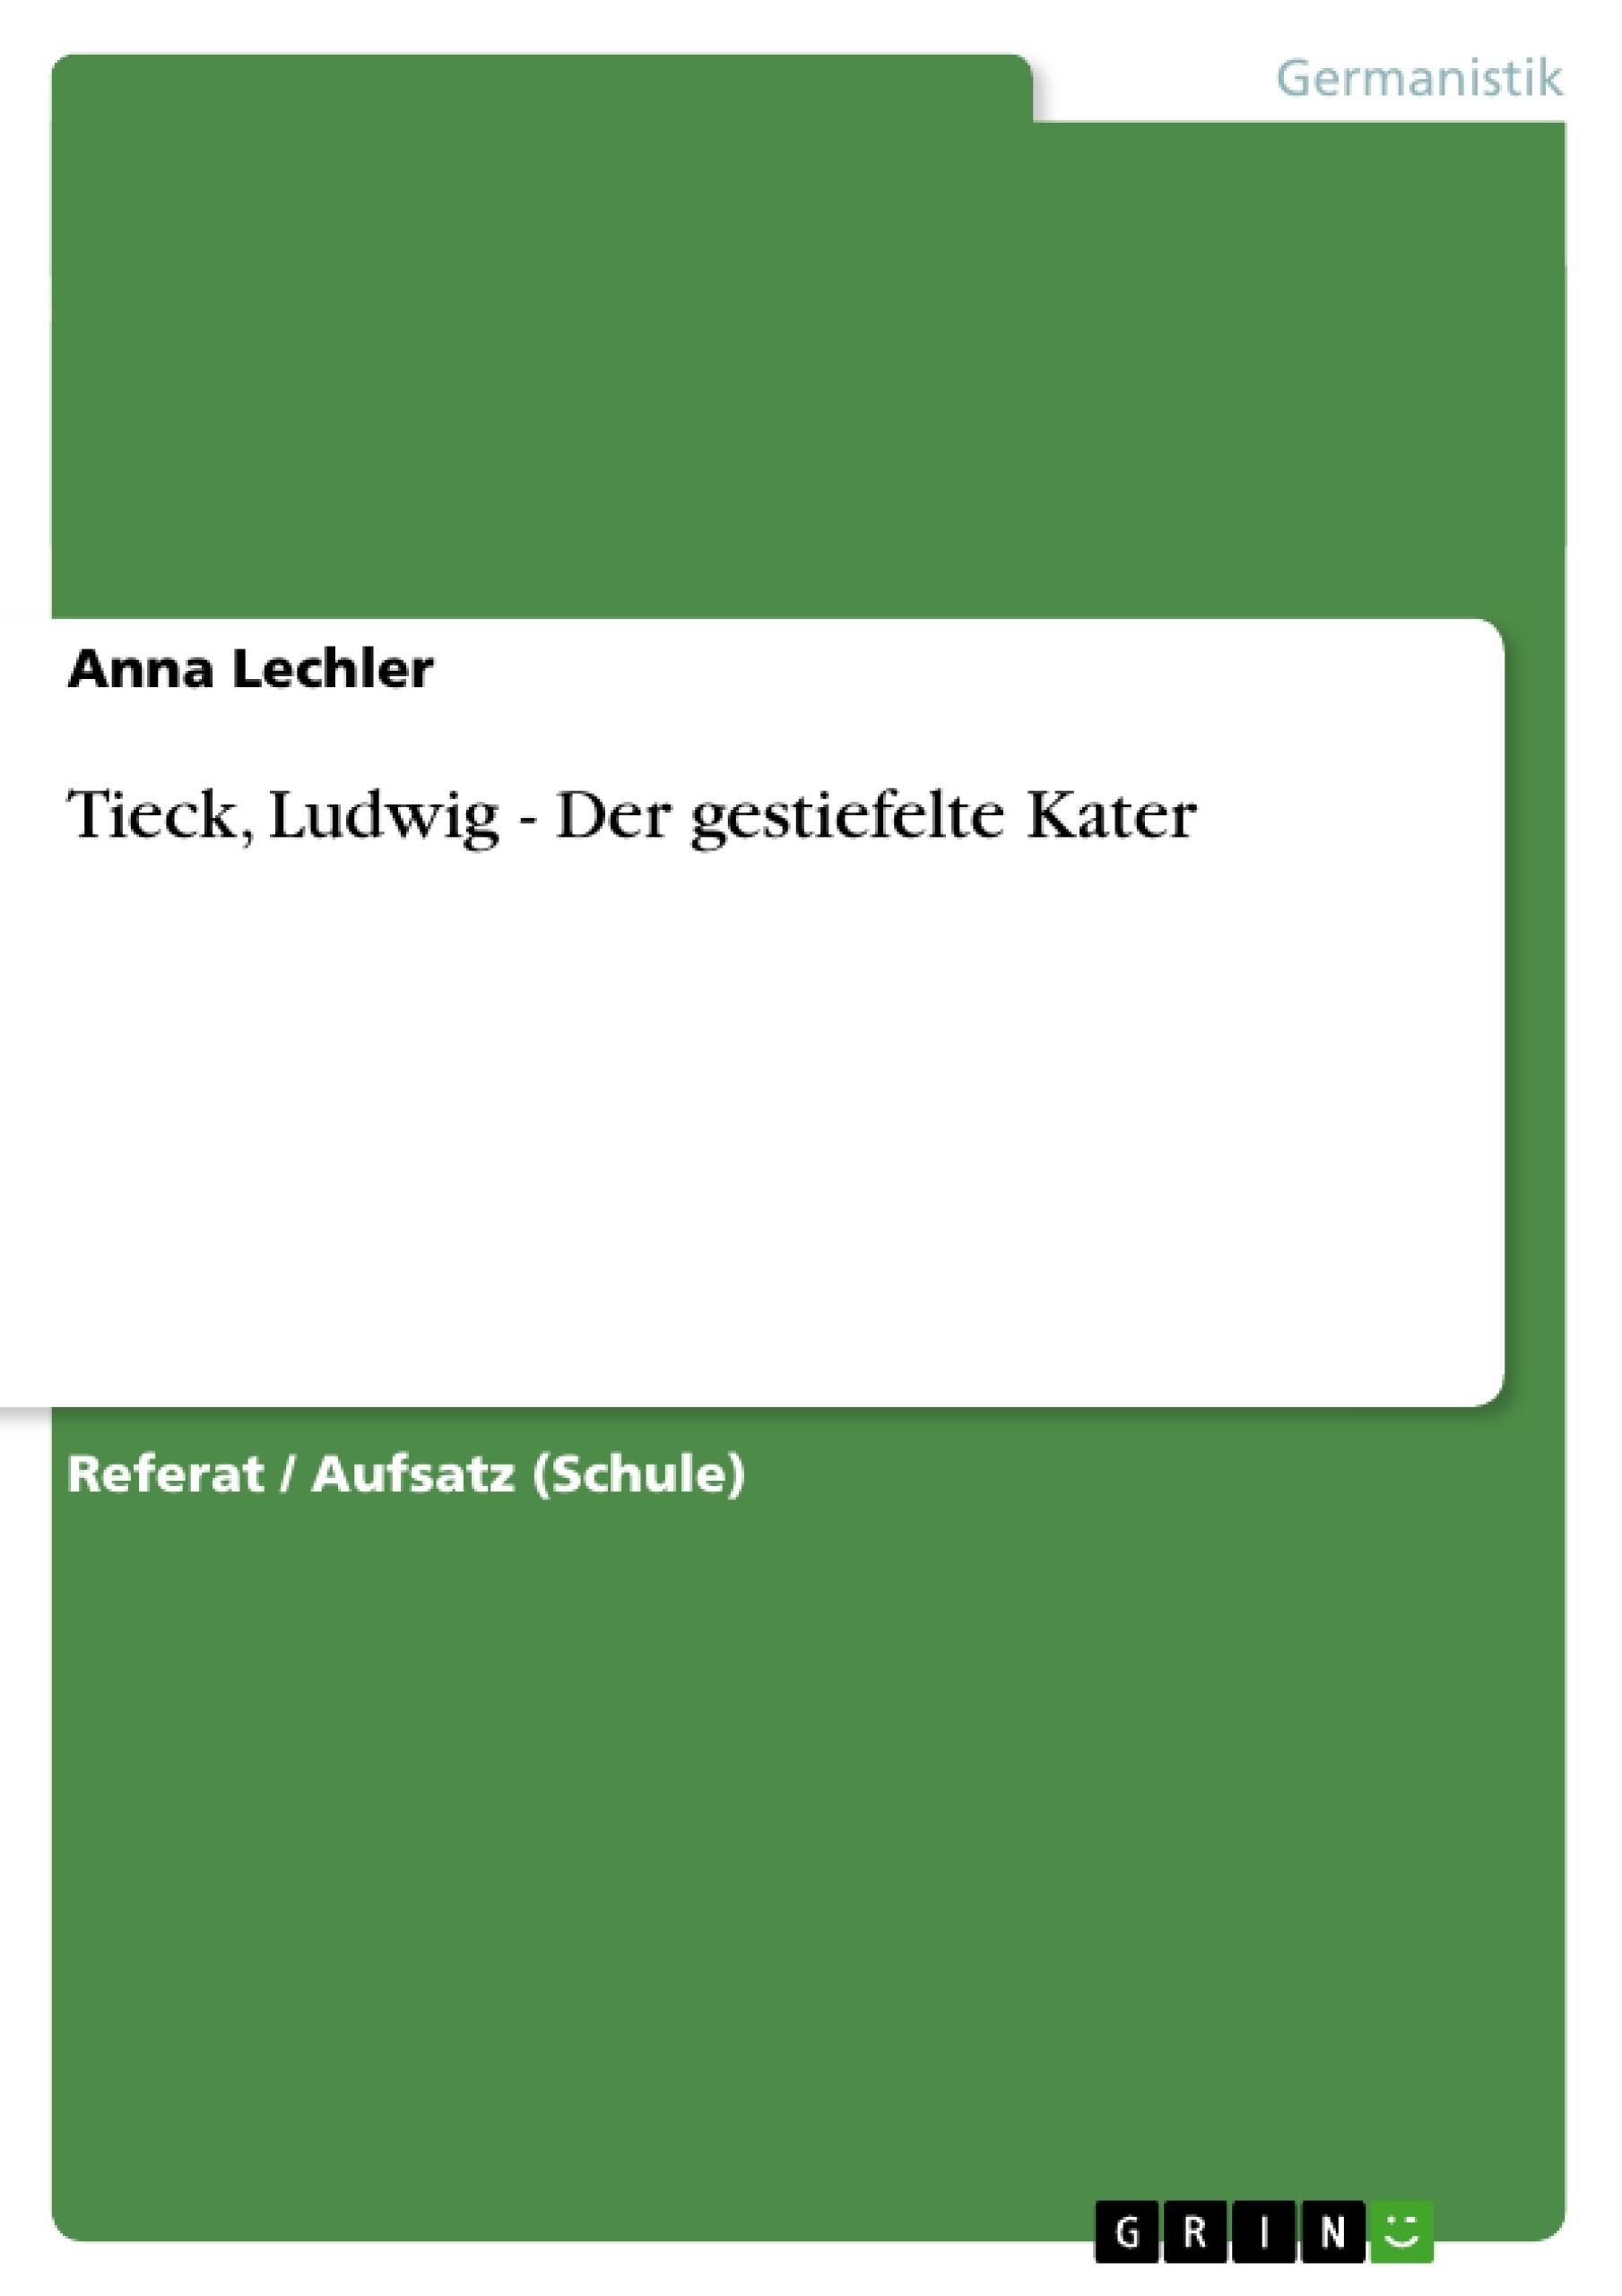 Titel: Tieck, Ludwig - Der gestiefelte Kater